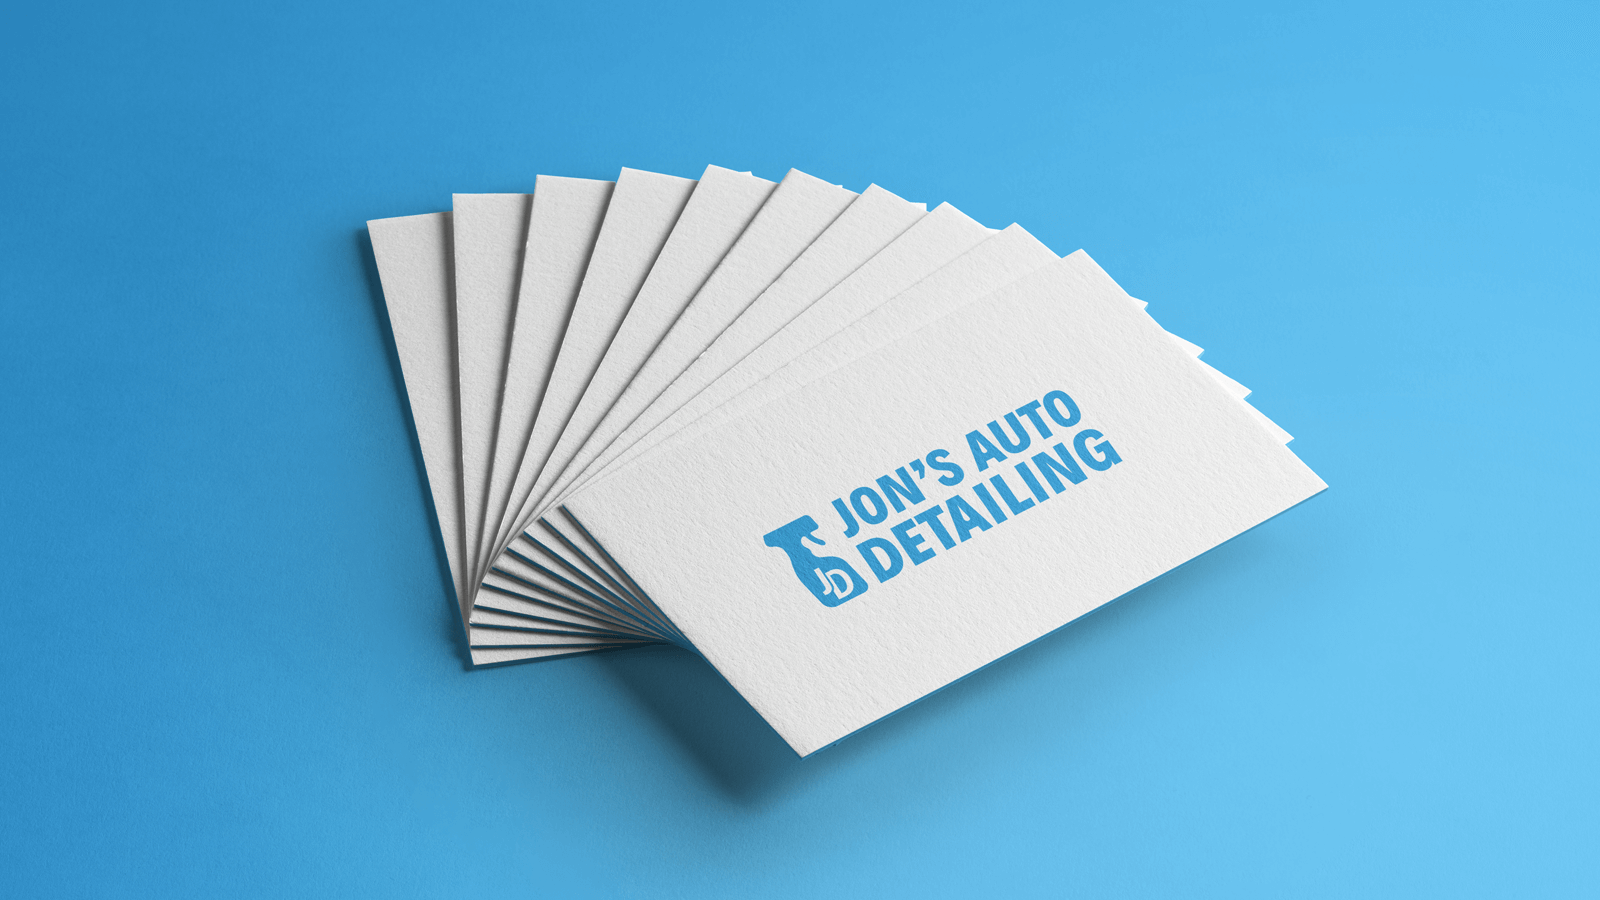 Jon's Auto Detailing - Branding + Identity Project